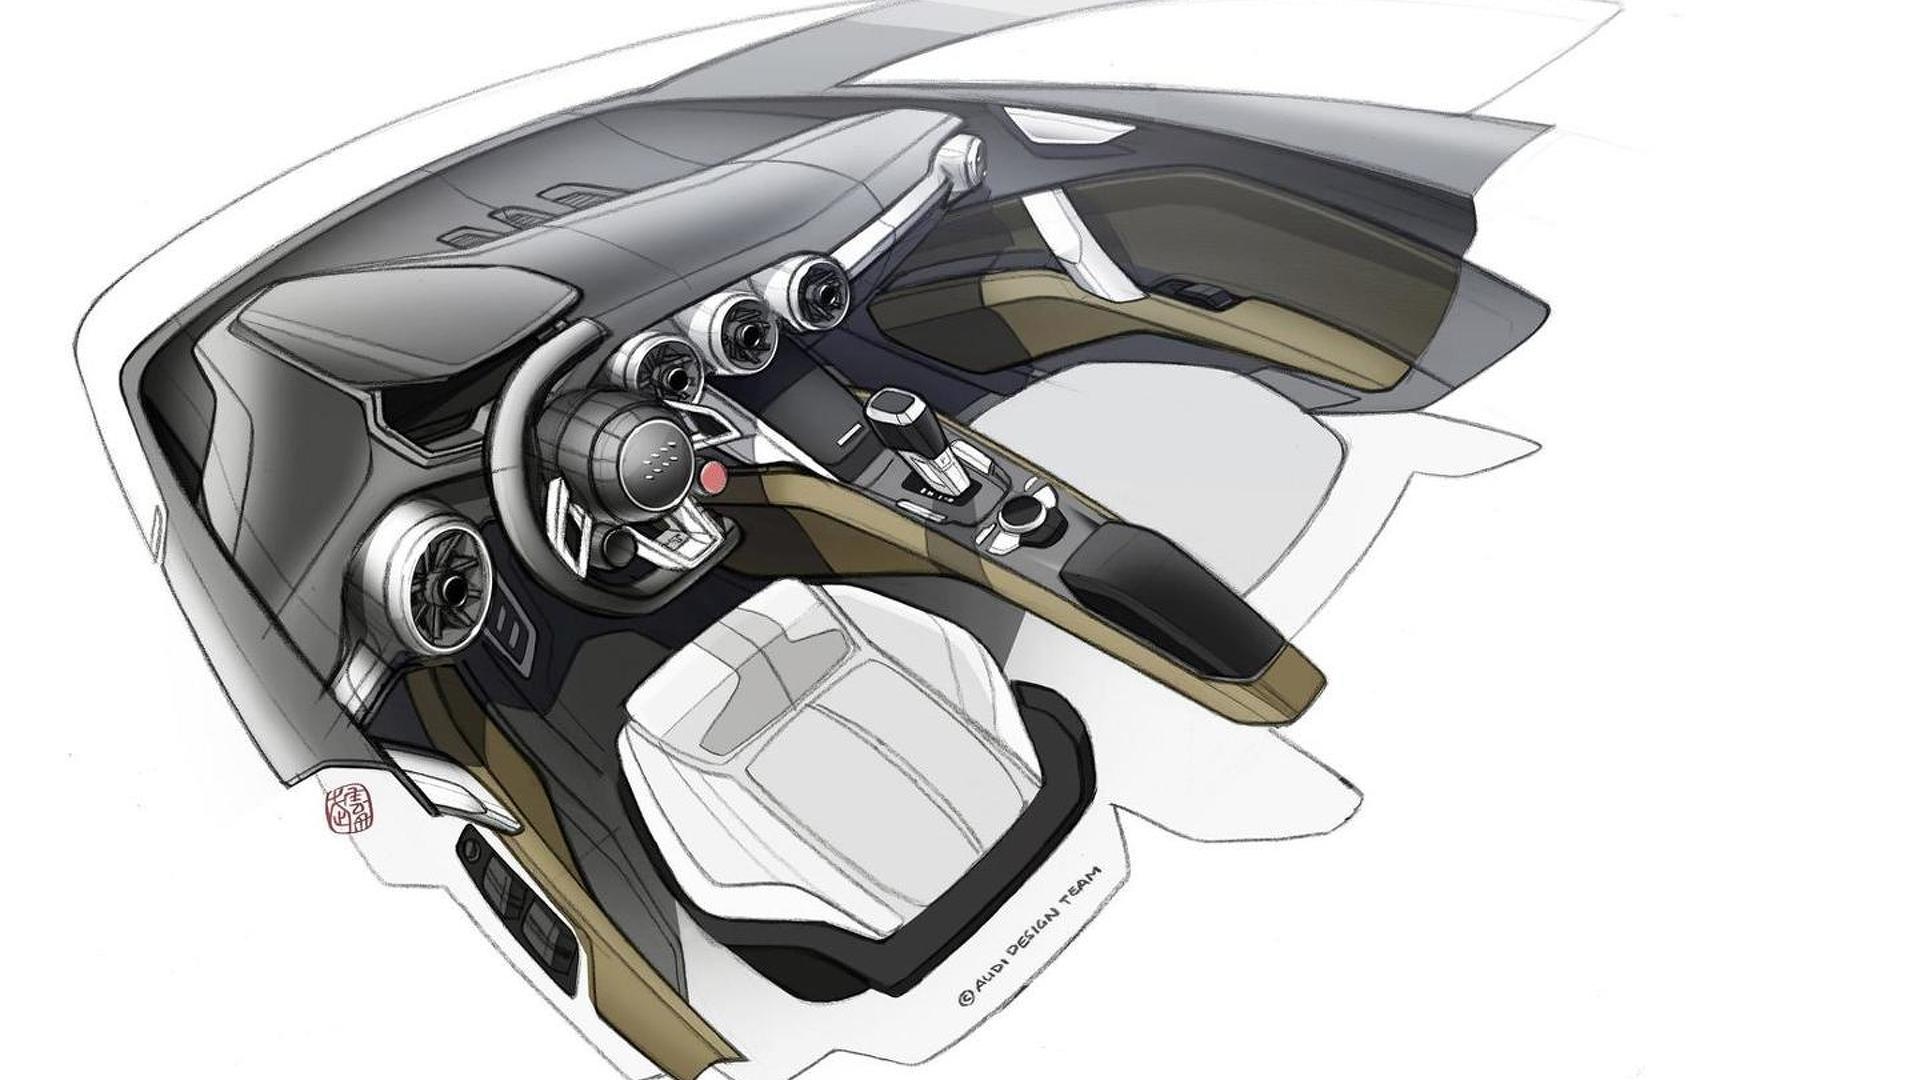 2014-469284-audi-tt-offroad-concept1.jpg